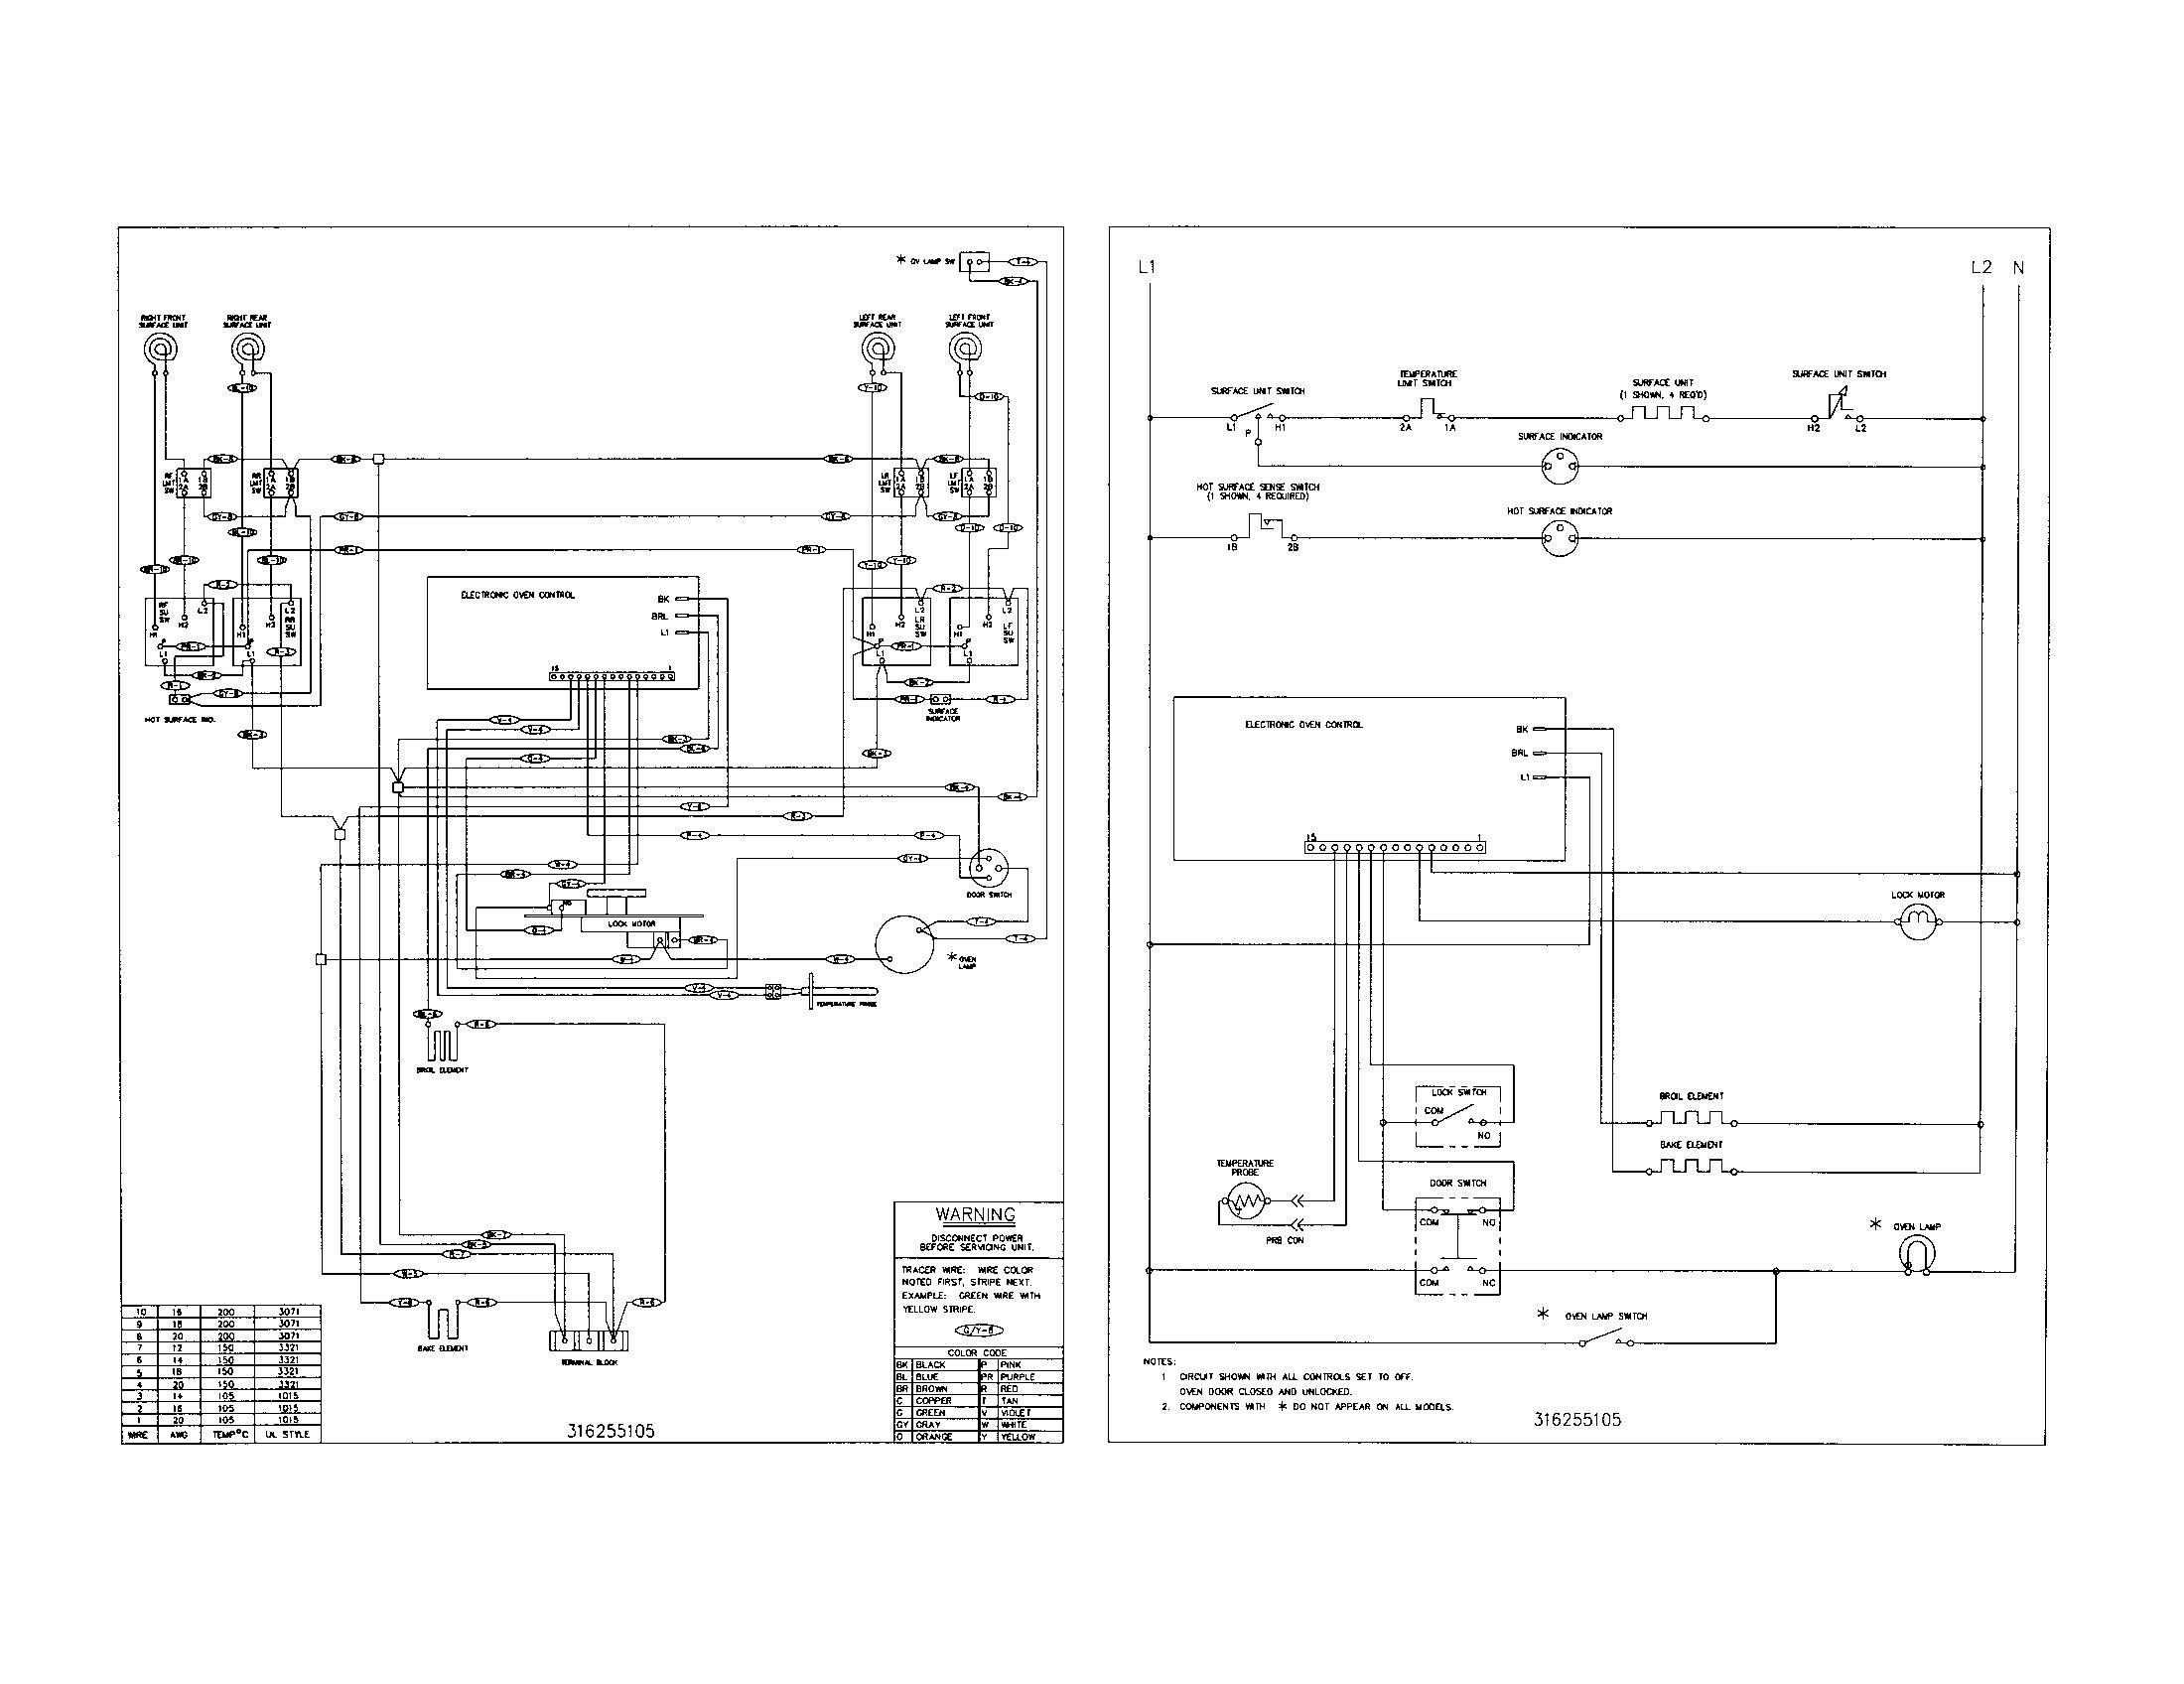 Frigidaire Fef366awa Electric Range Timer